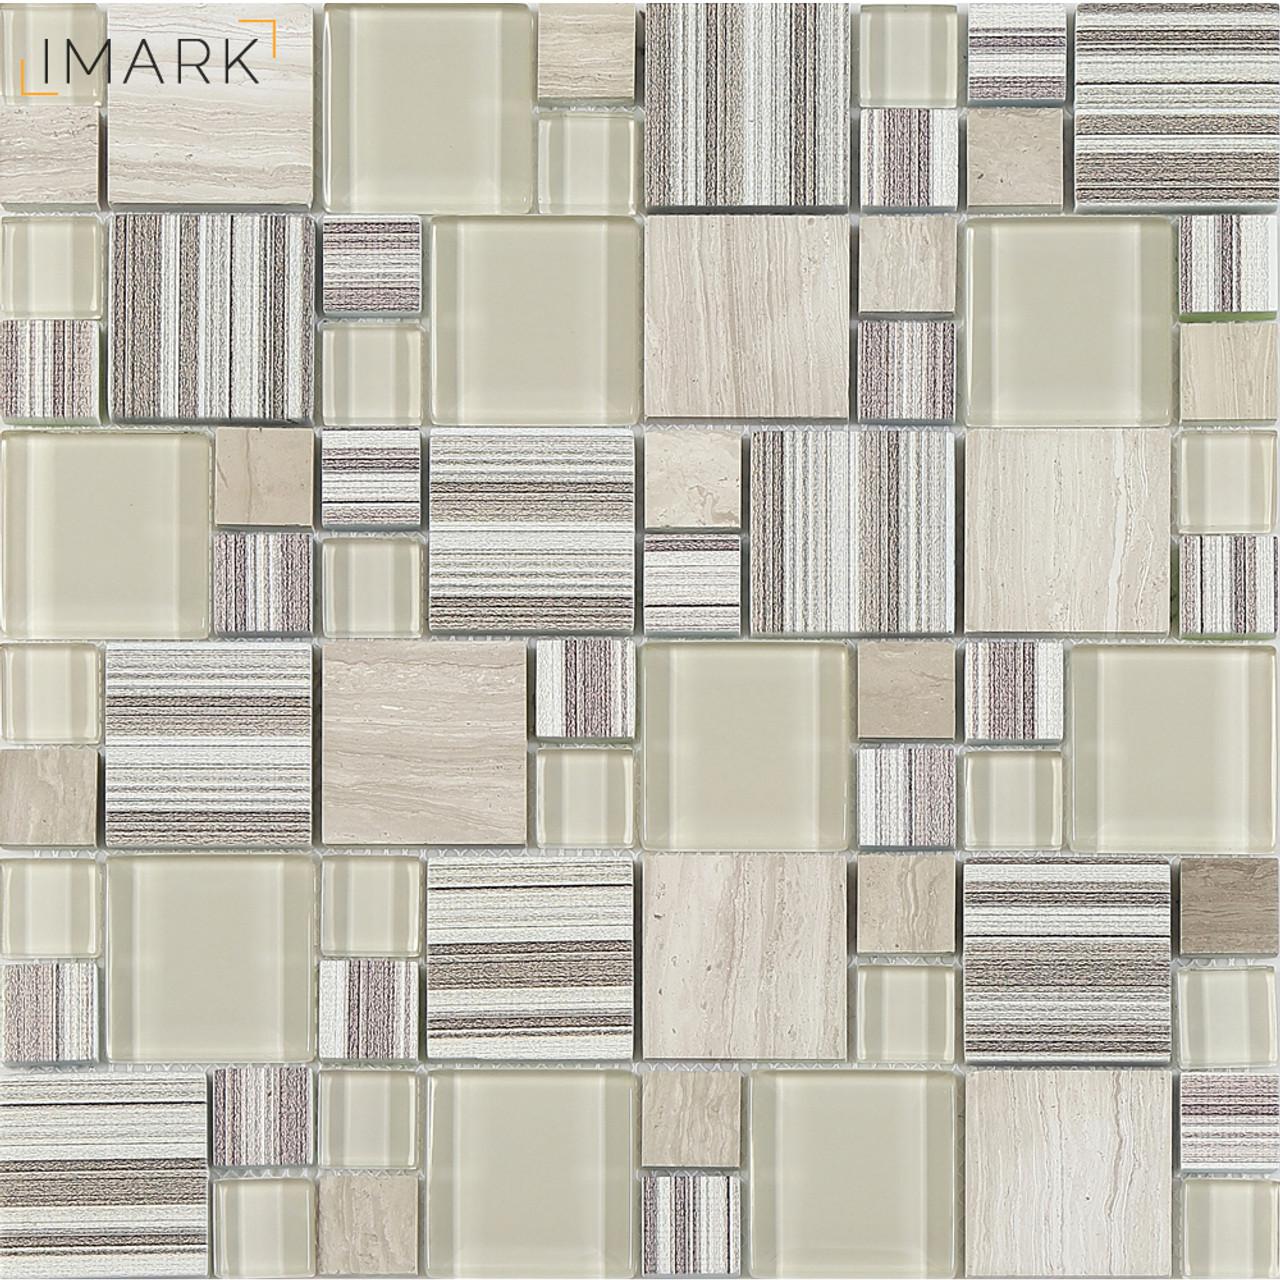 Fabric Texture Digital Inkjet Printed Glass Mosaic Tile For Kitchen Backspalsh